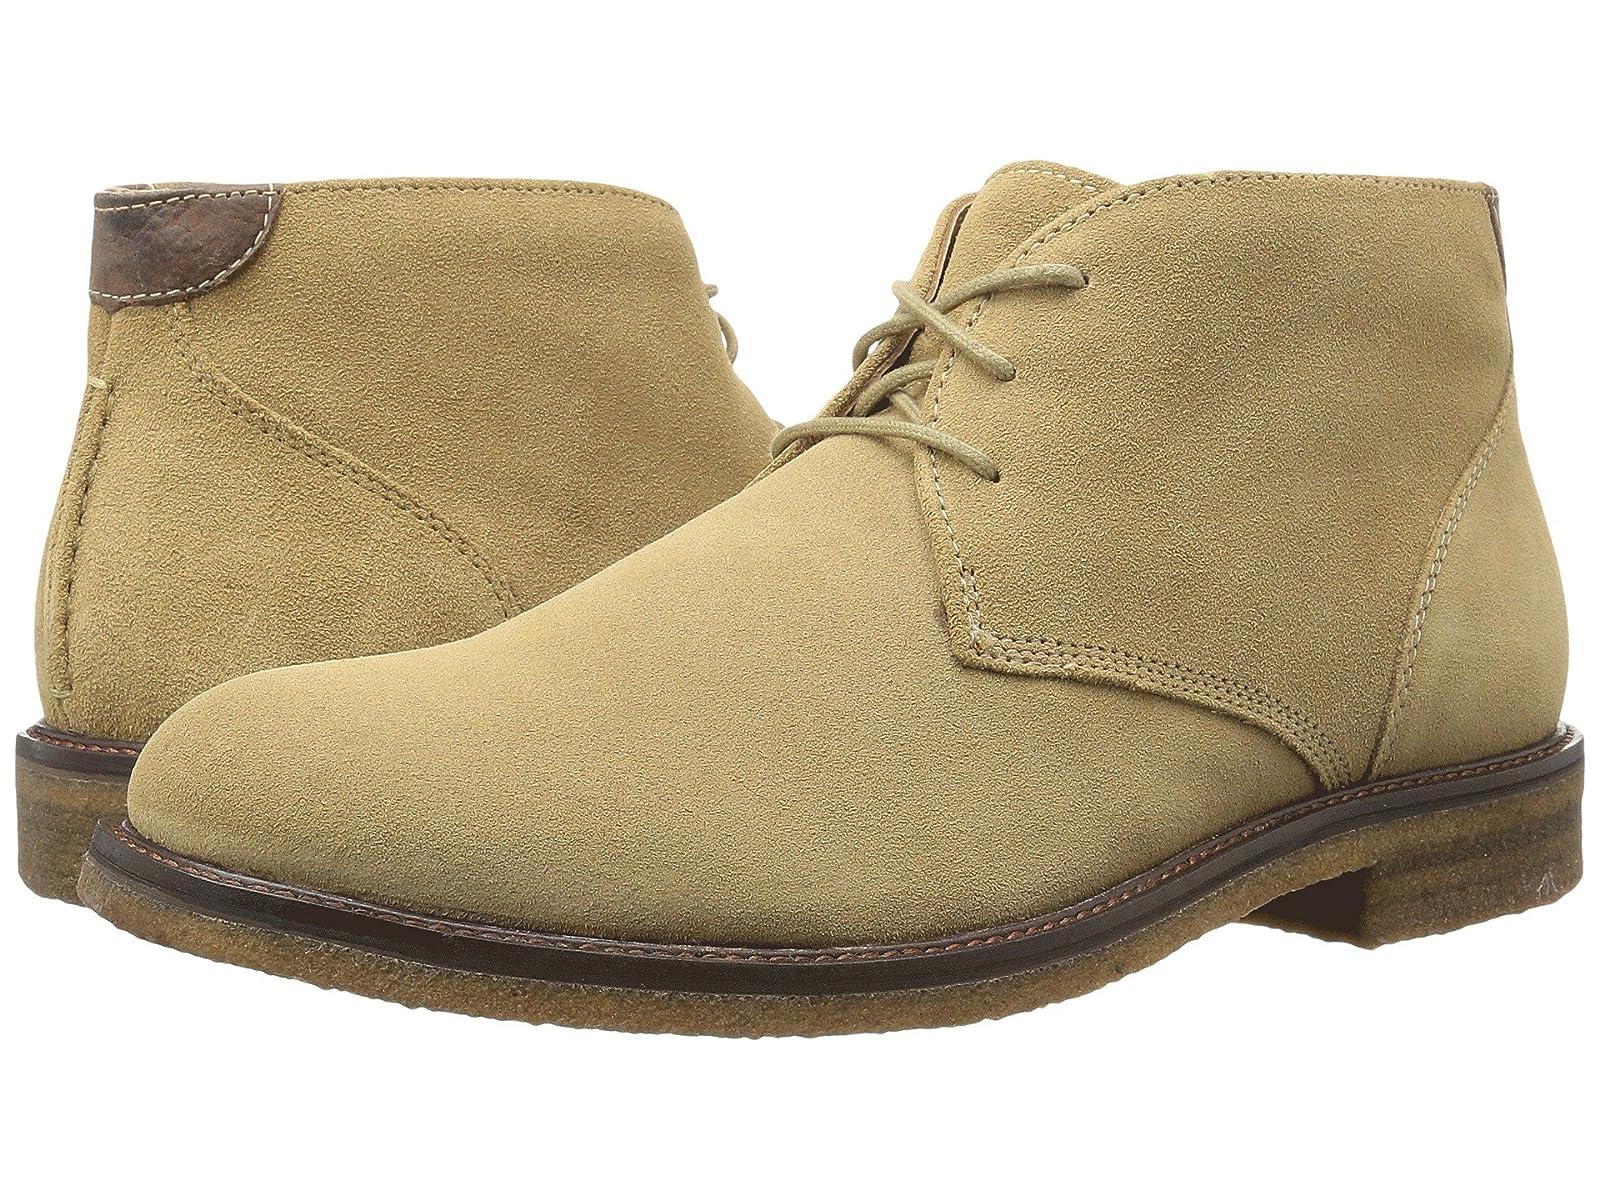 Johnston & Murphy Copeland Casual Chukka BootCheap and distinctive eye-catching shoes